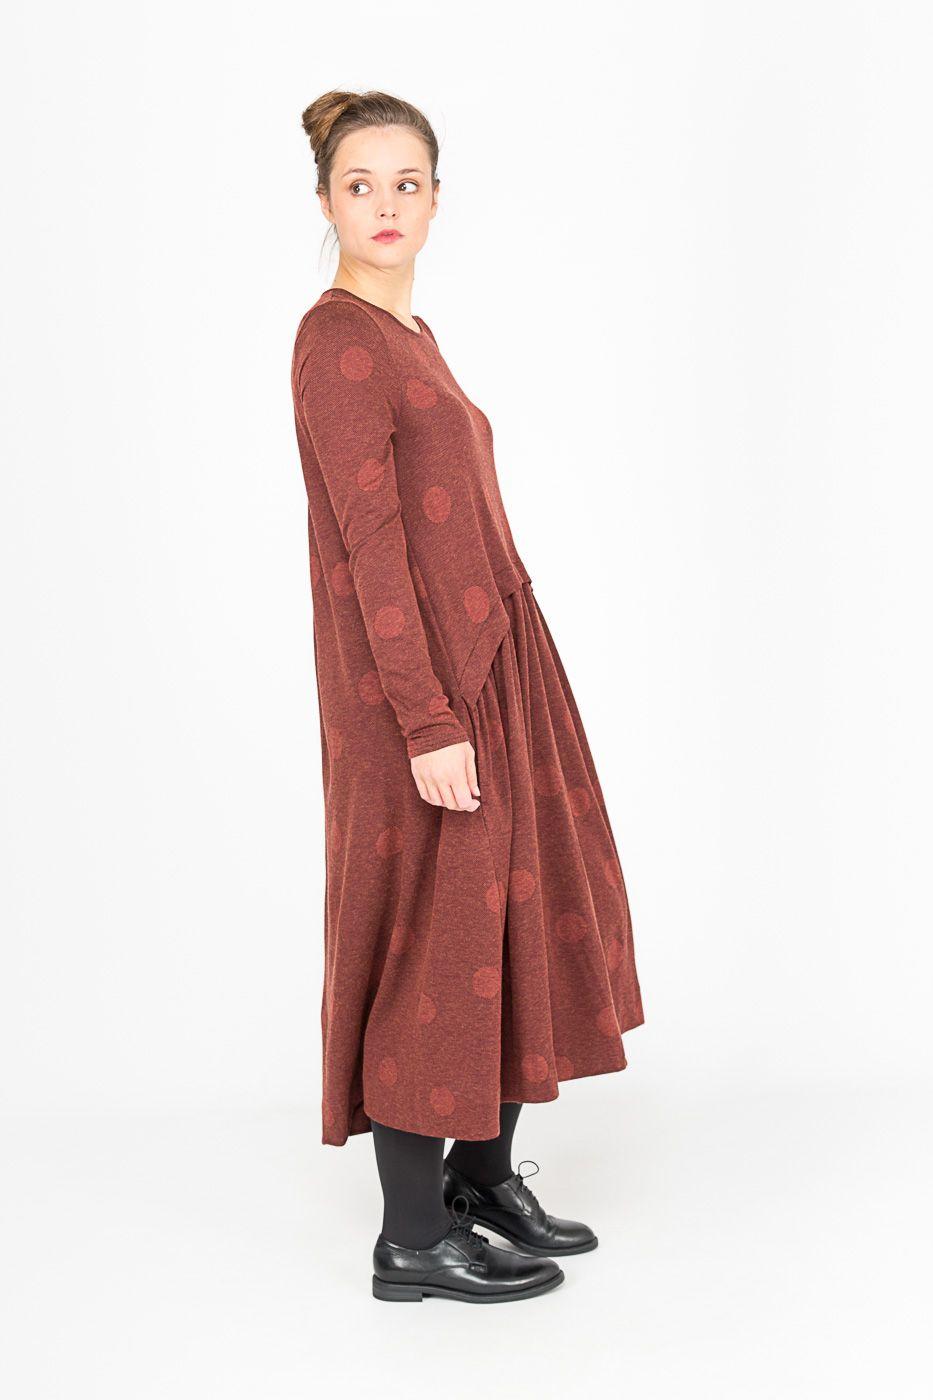 71ece3e4f05e9 Robe Lilith • mode femme - Pois en ton sur ton #robe #lilith #FW17 #pois